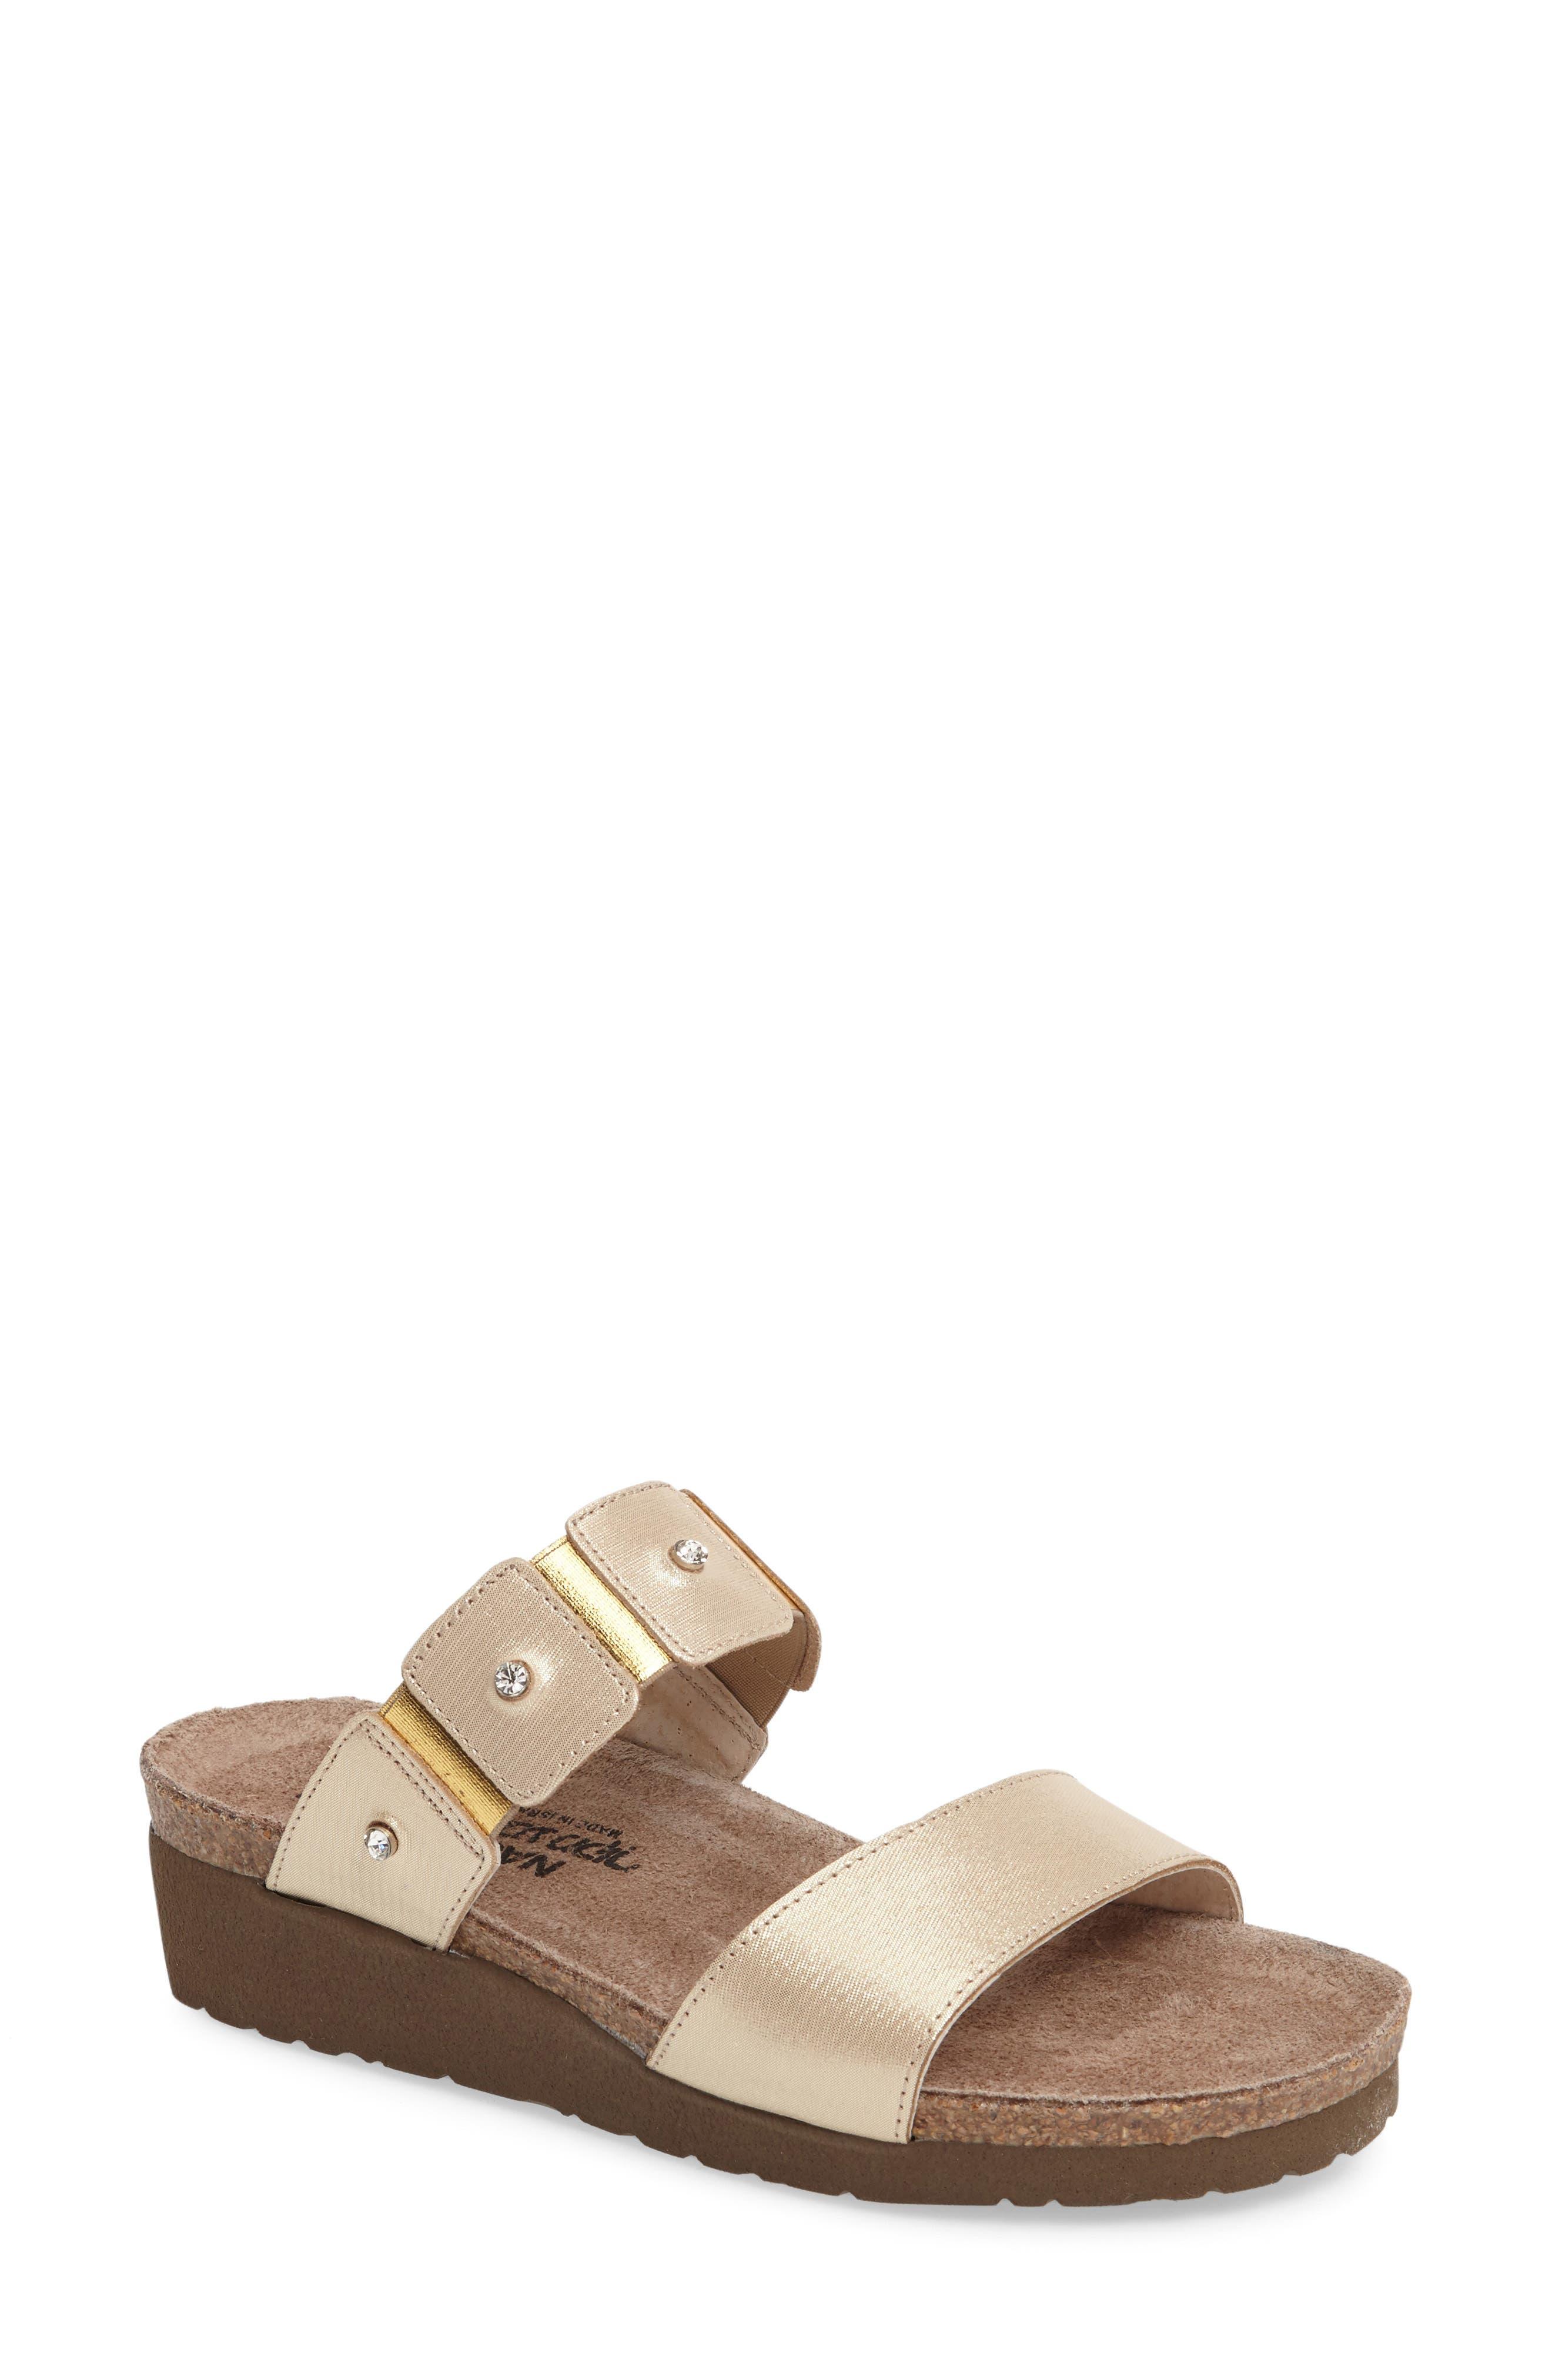 Women's Naot 'Ashley' Sandal, Size 4US - Metallic